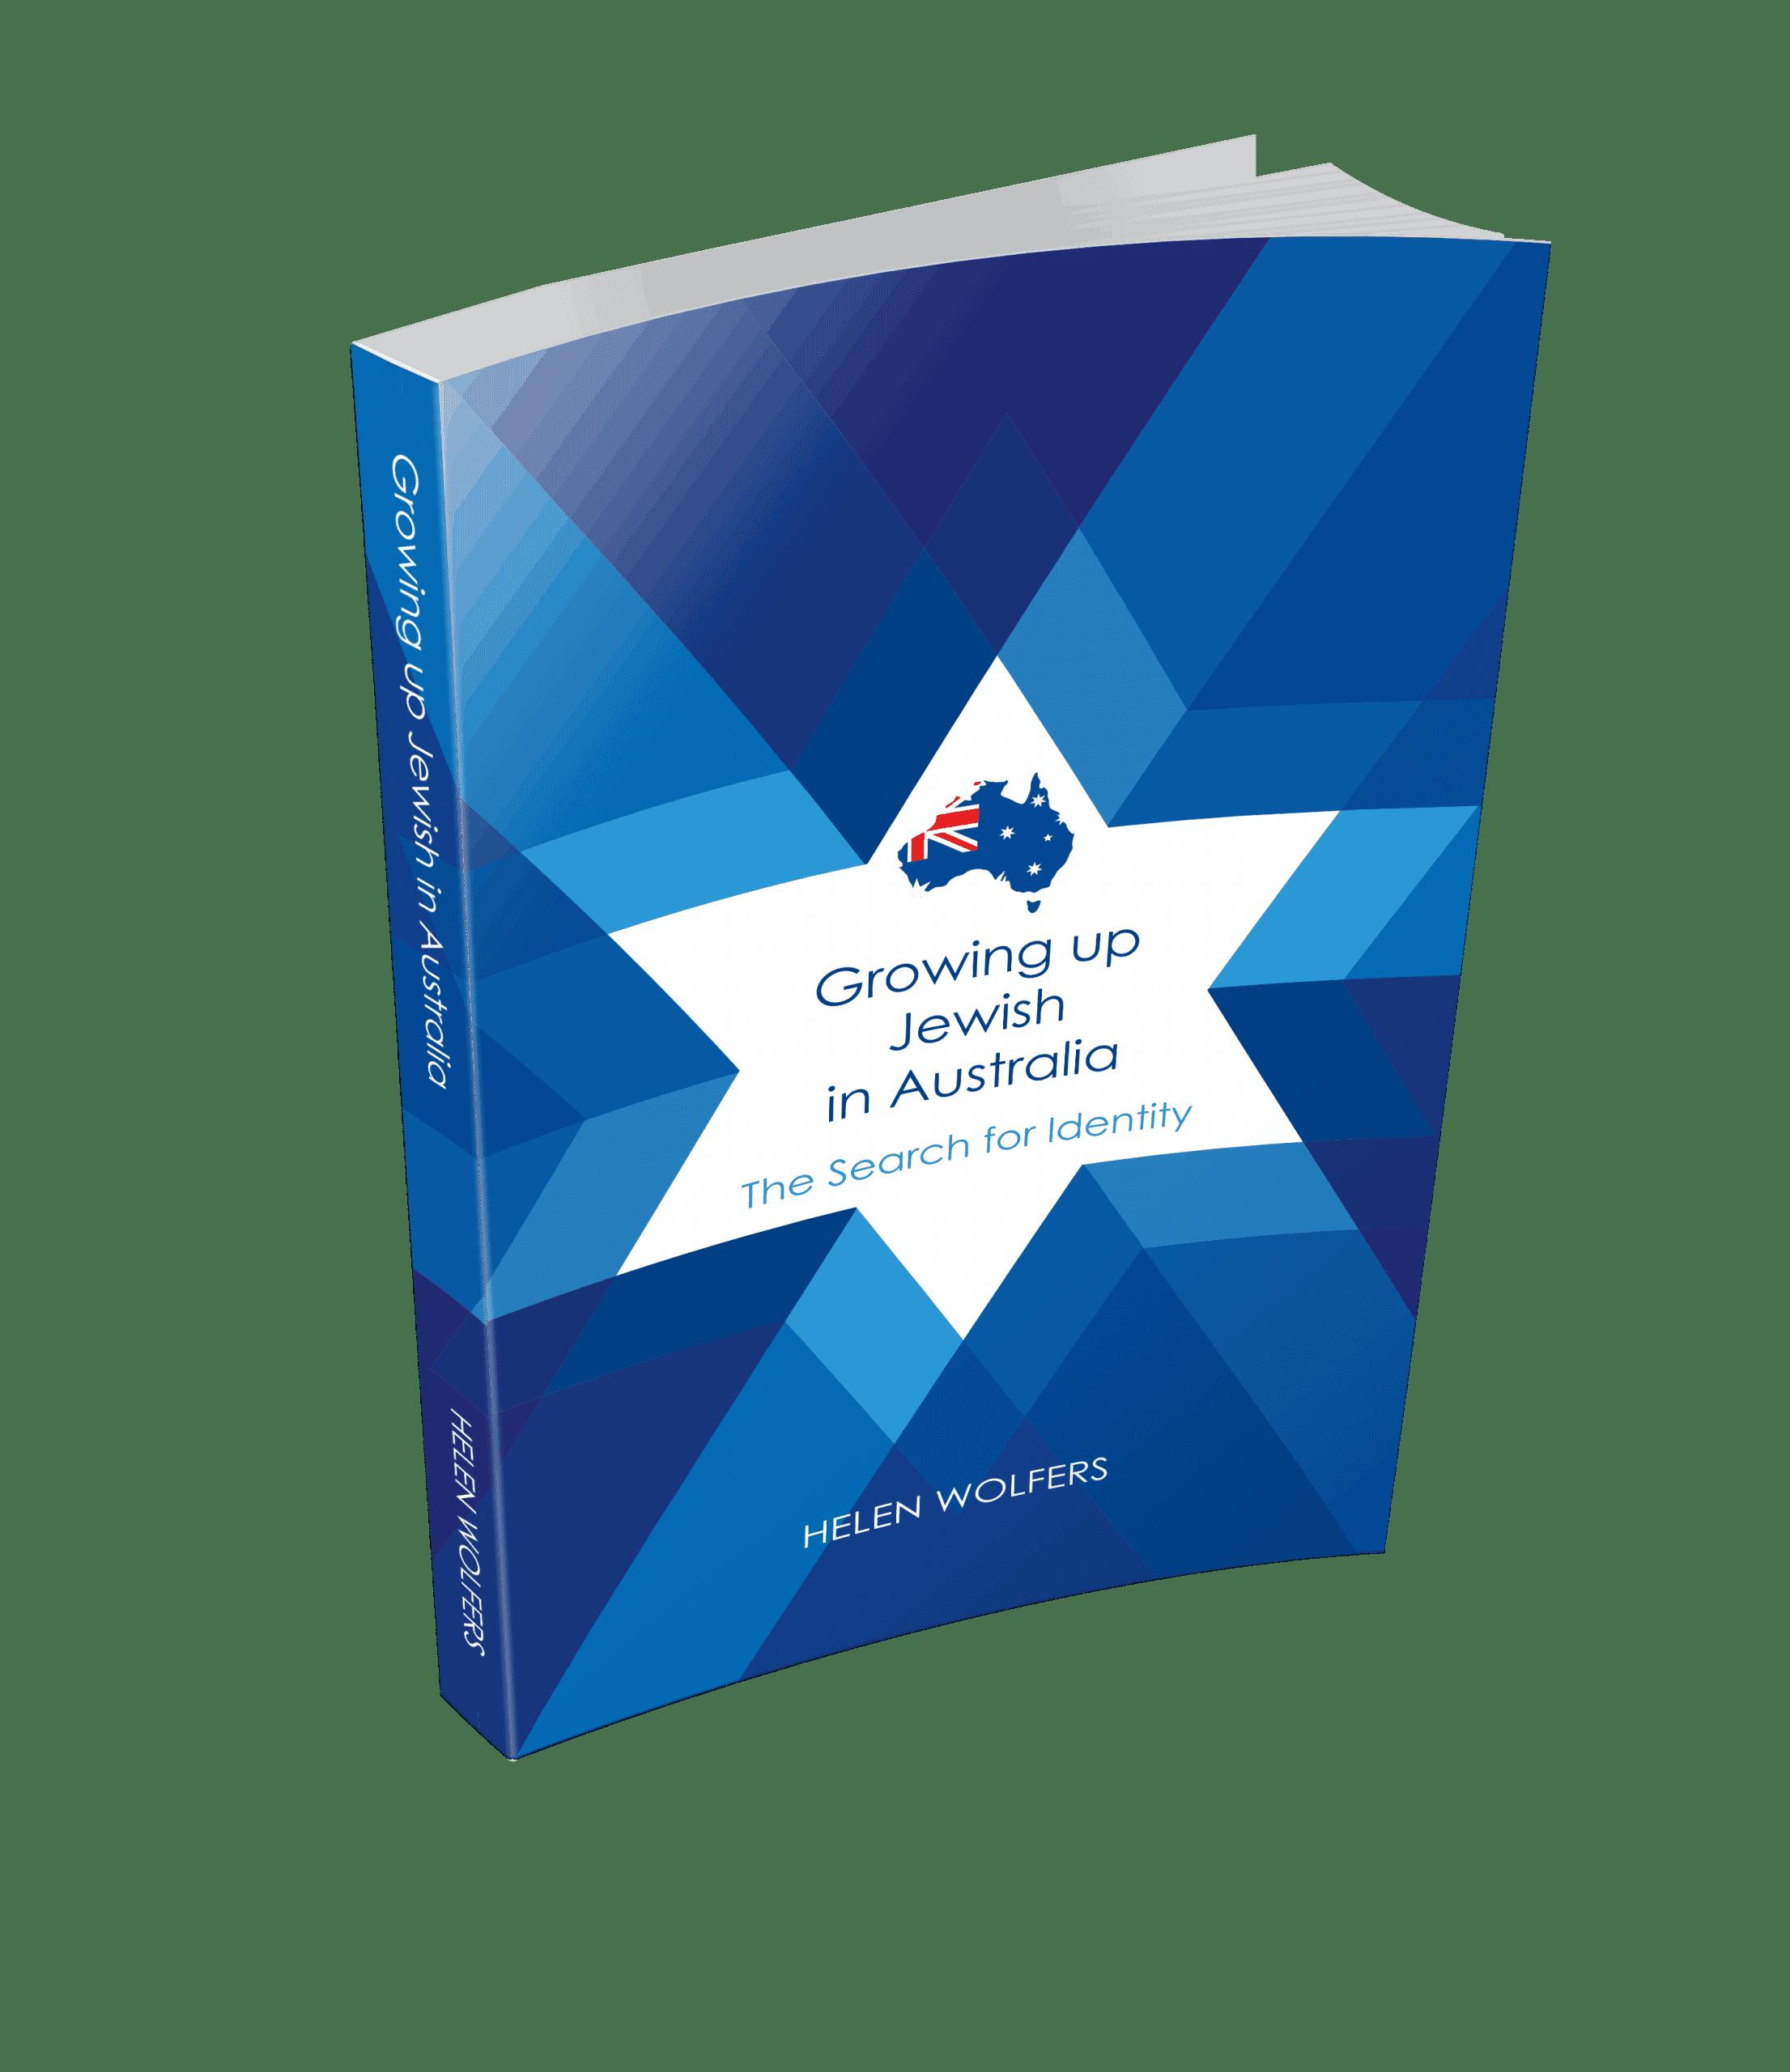 growing up Jewish, self-publishing, print on demand, book printing